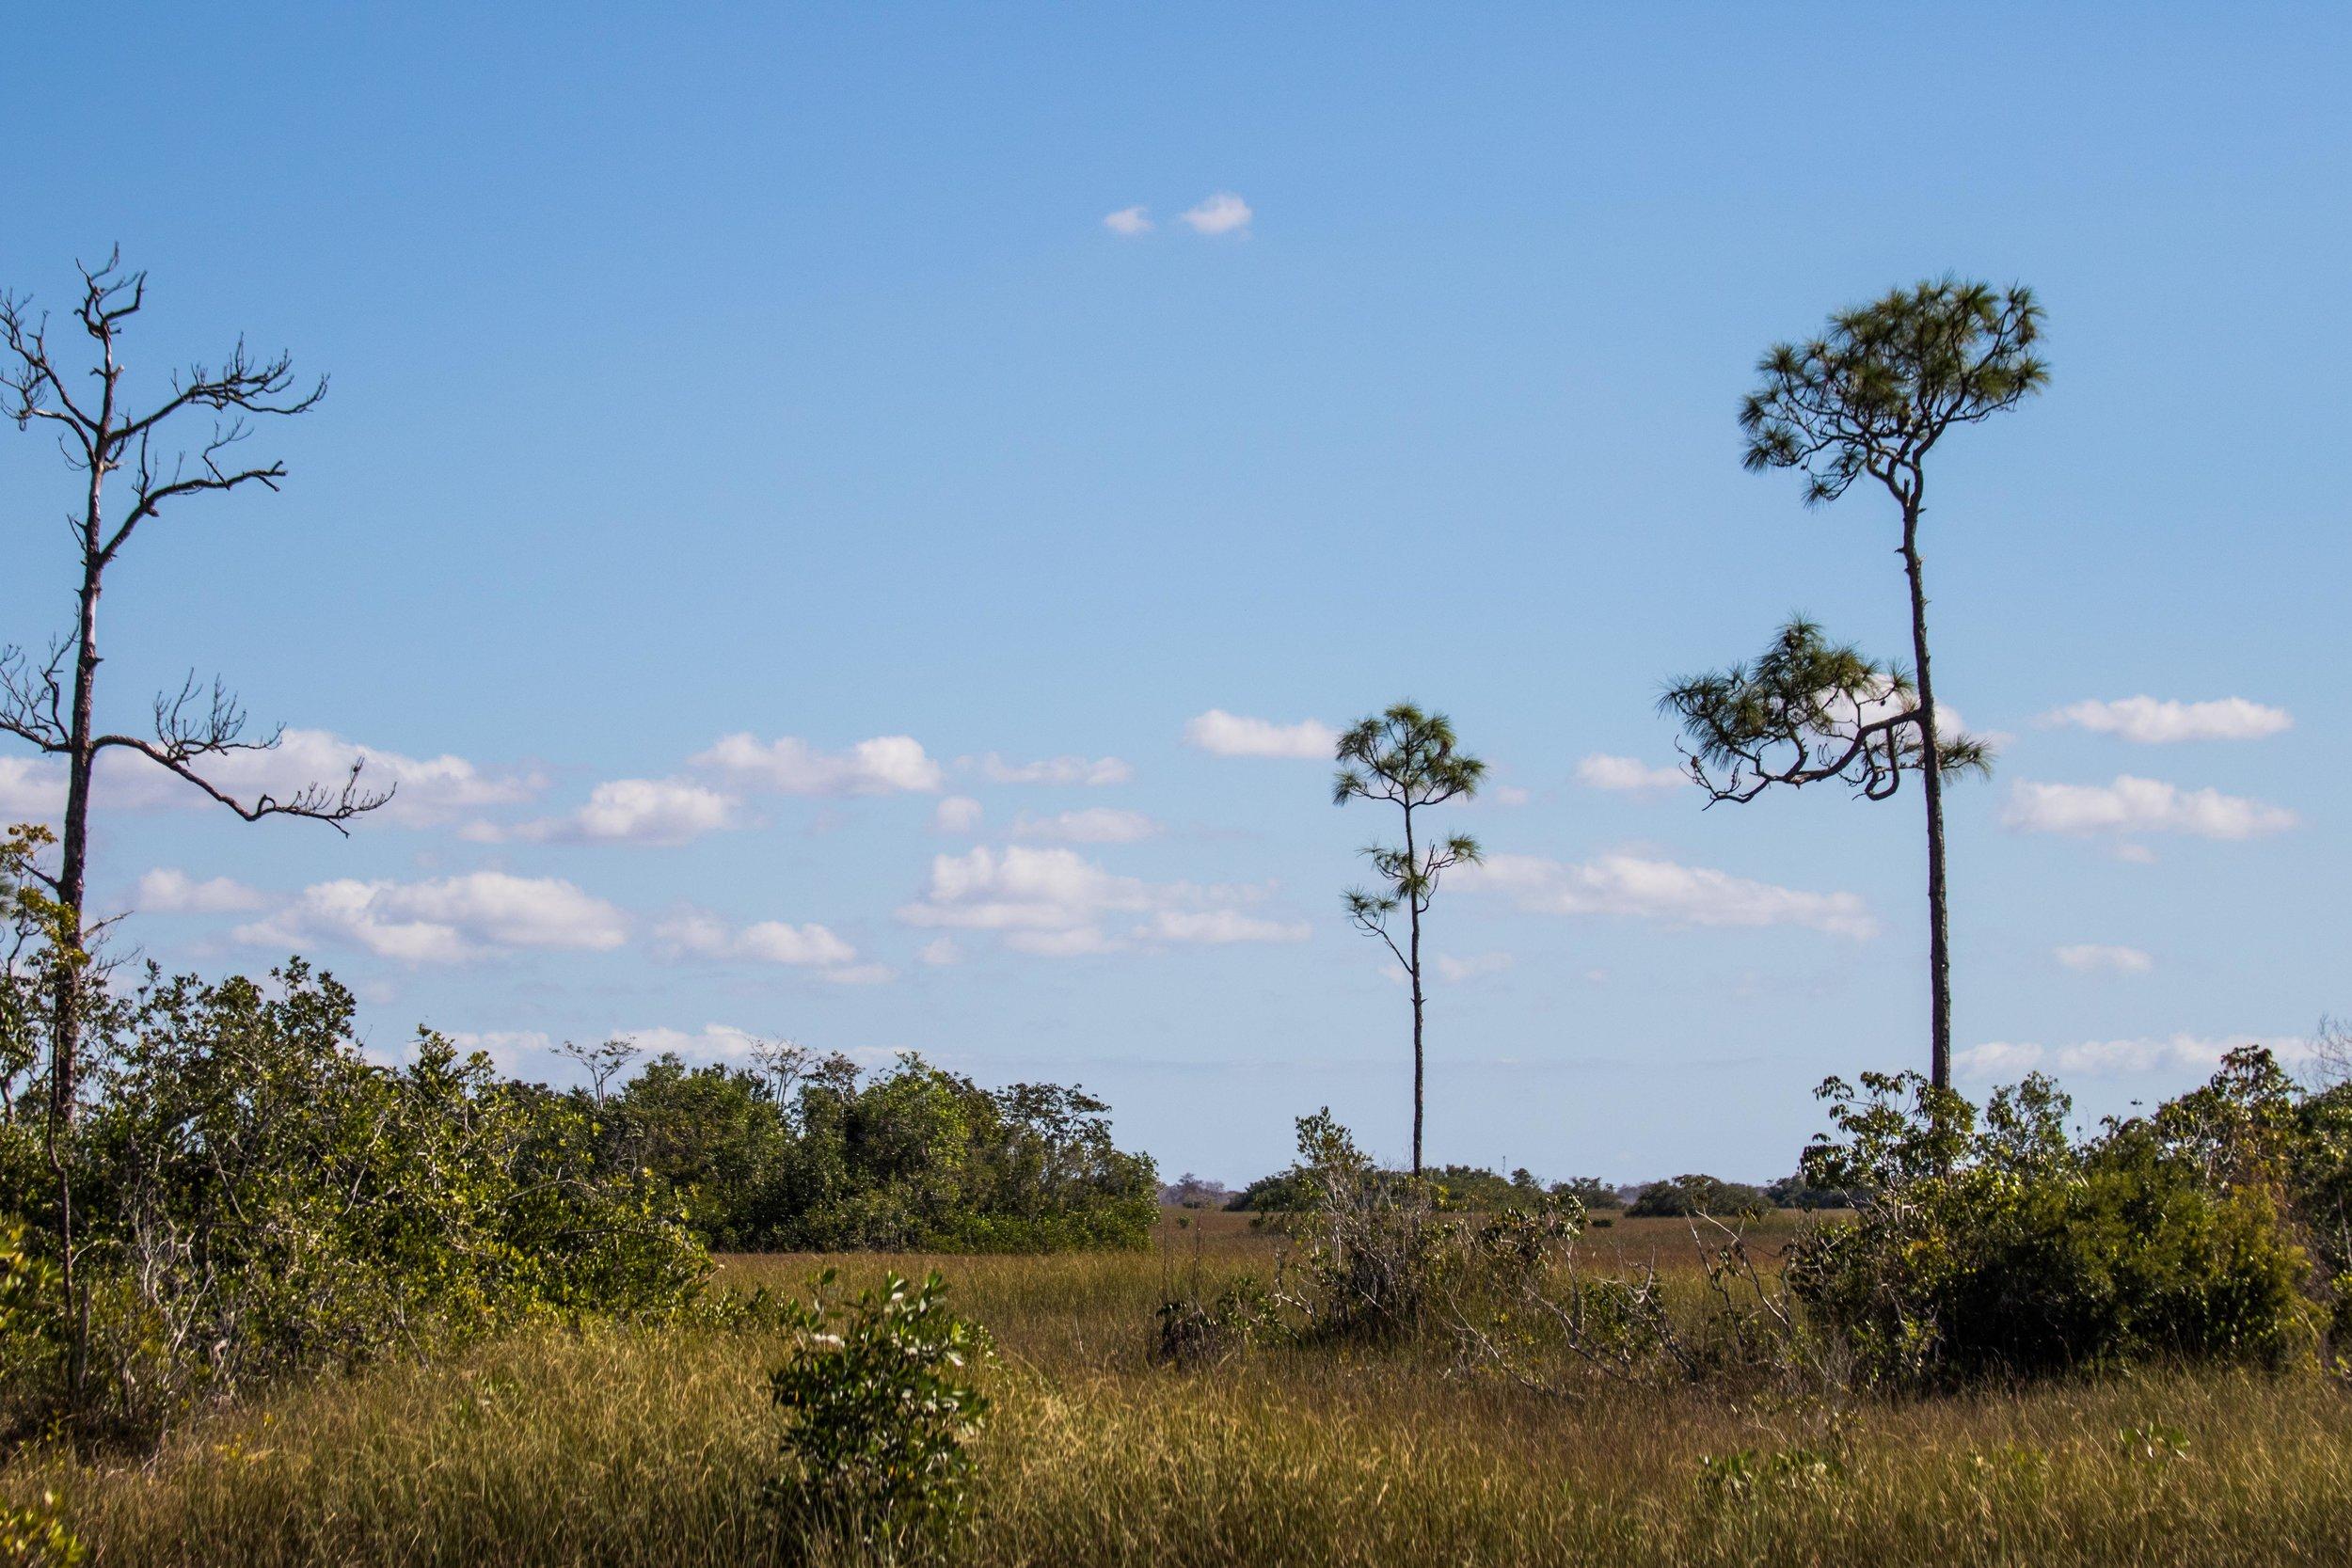 2019_Everglades-184.jpg